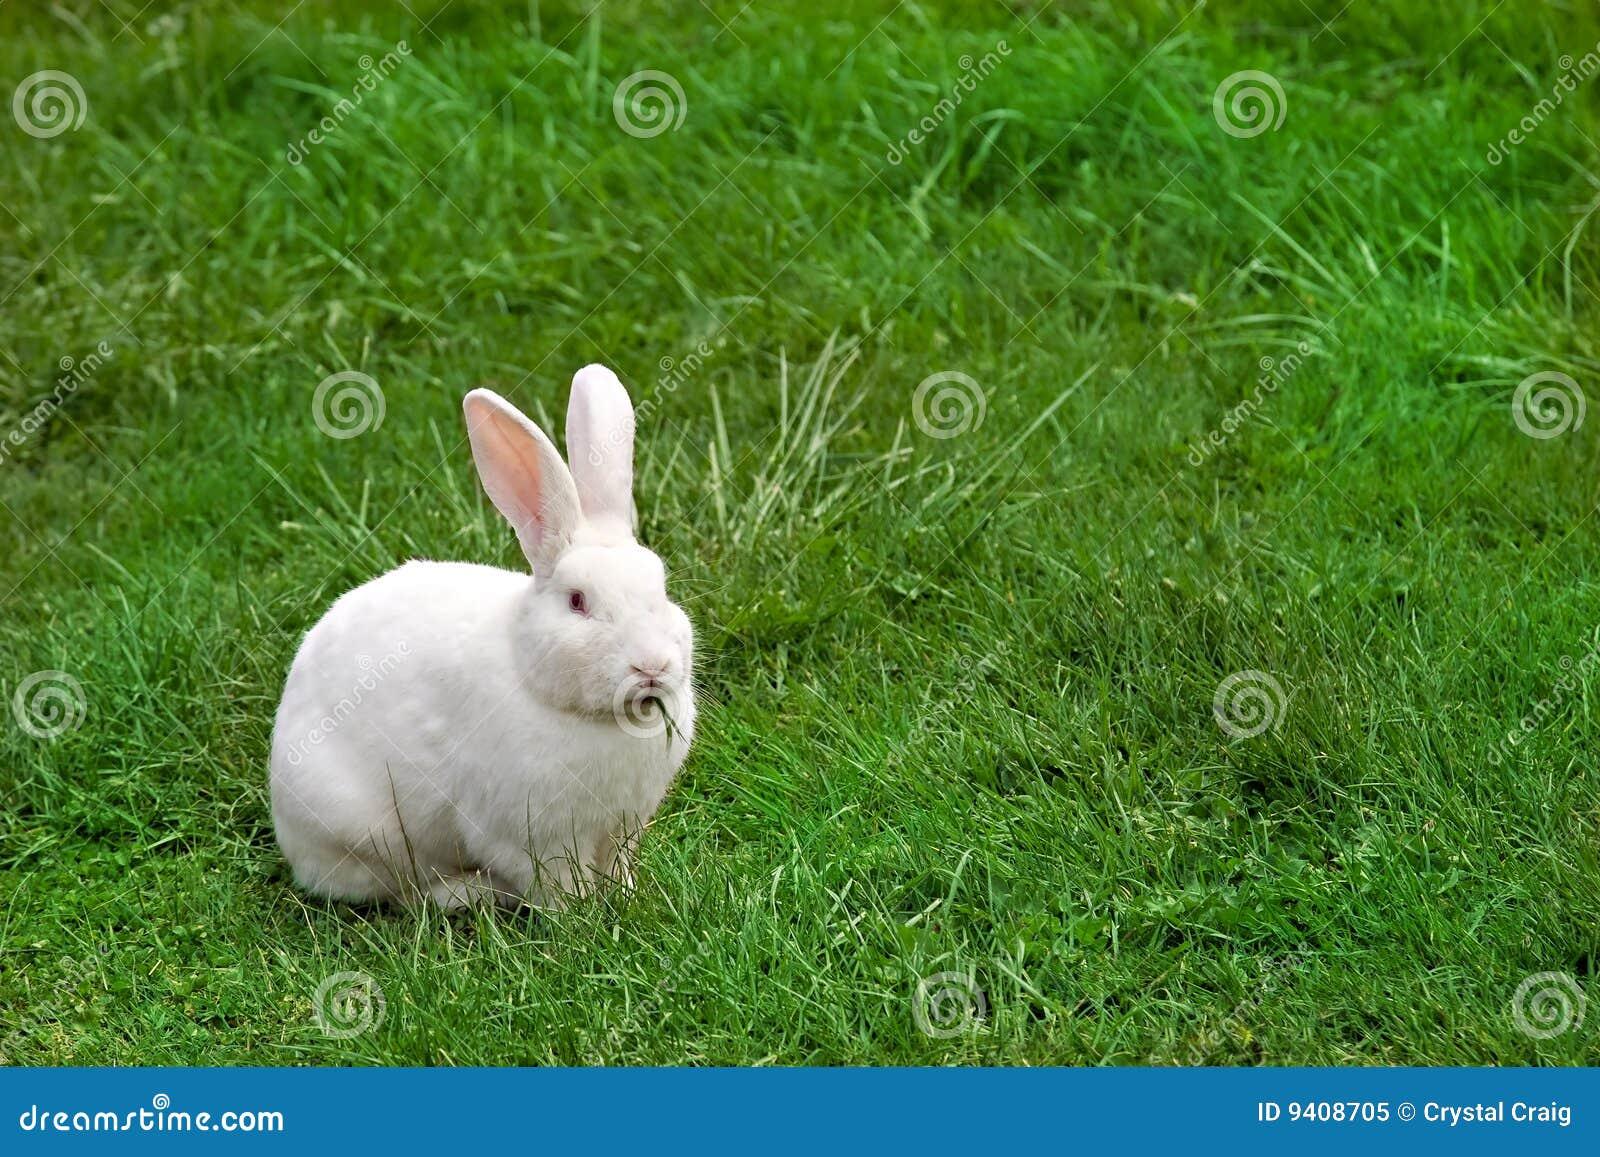 Lapin blanc mâchant l herbe